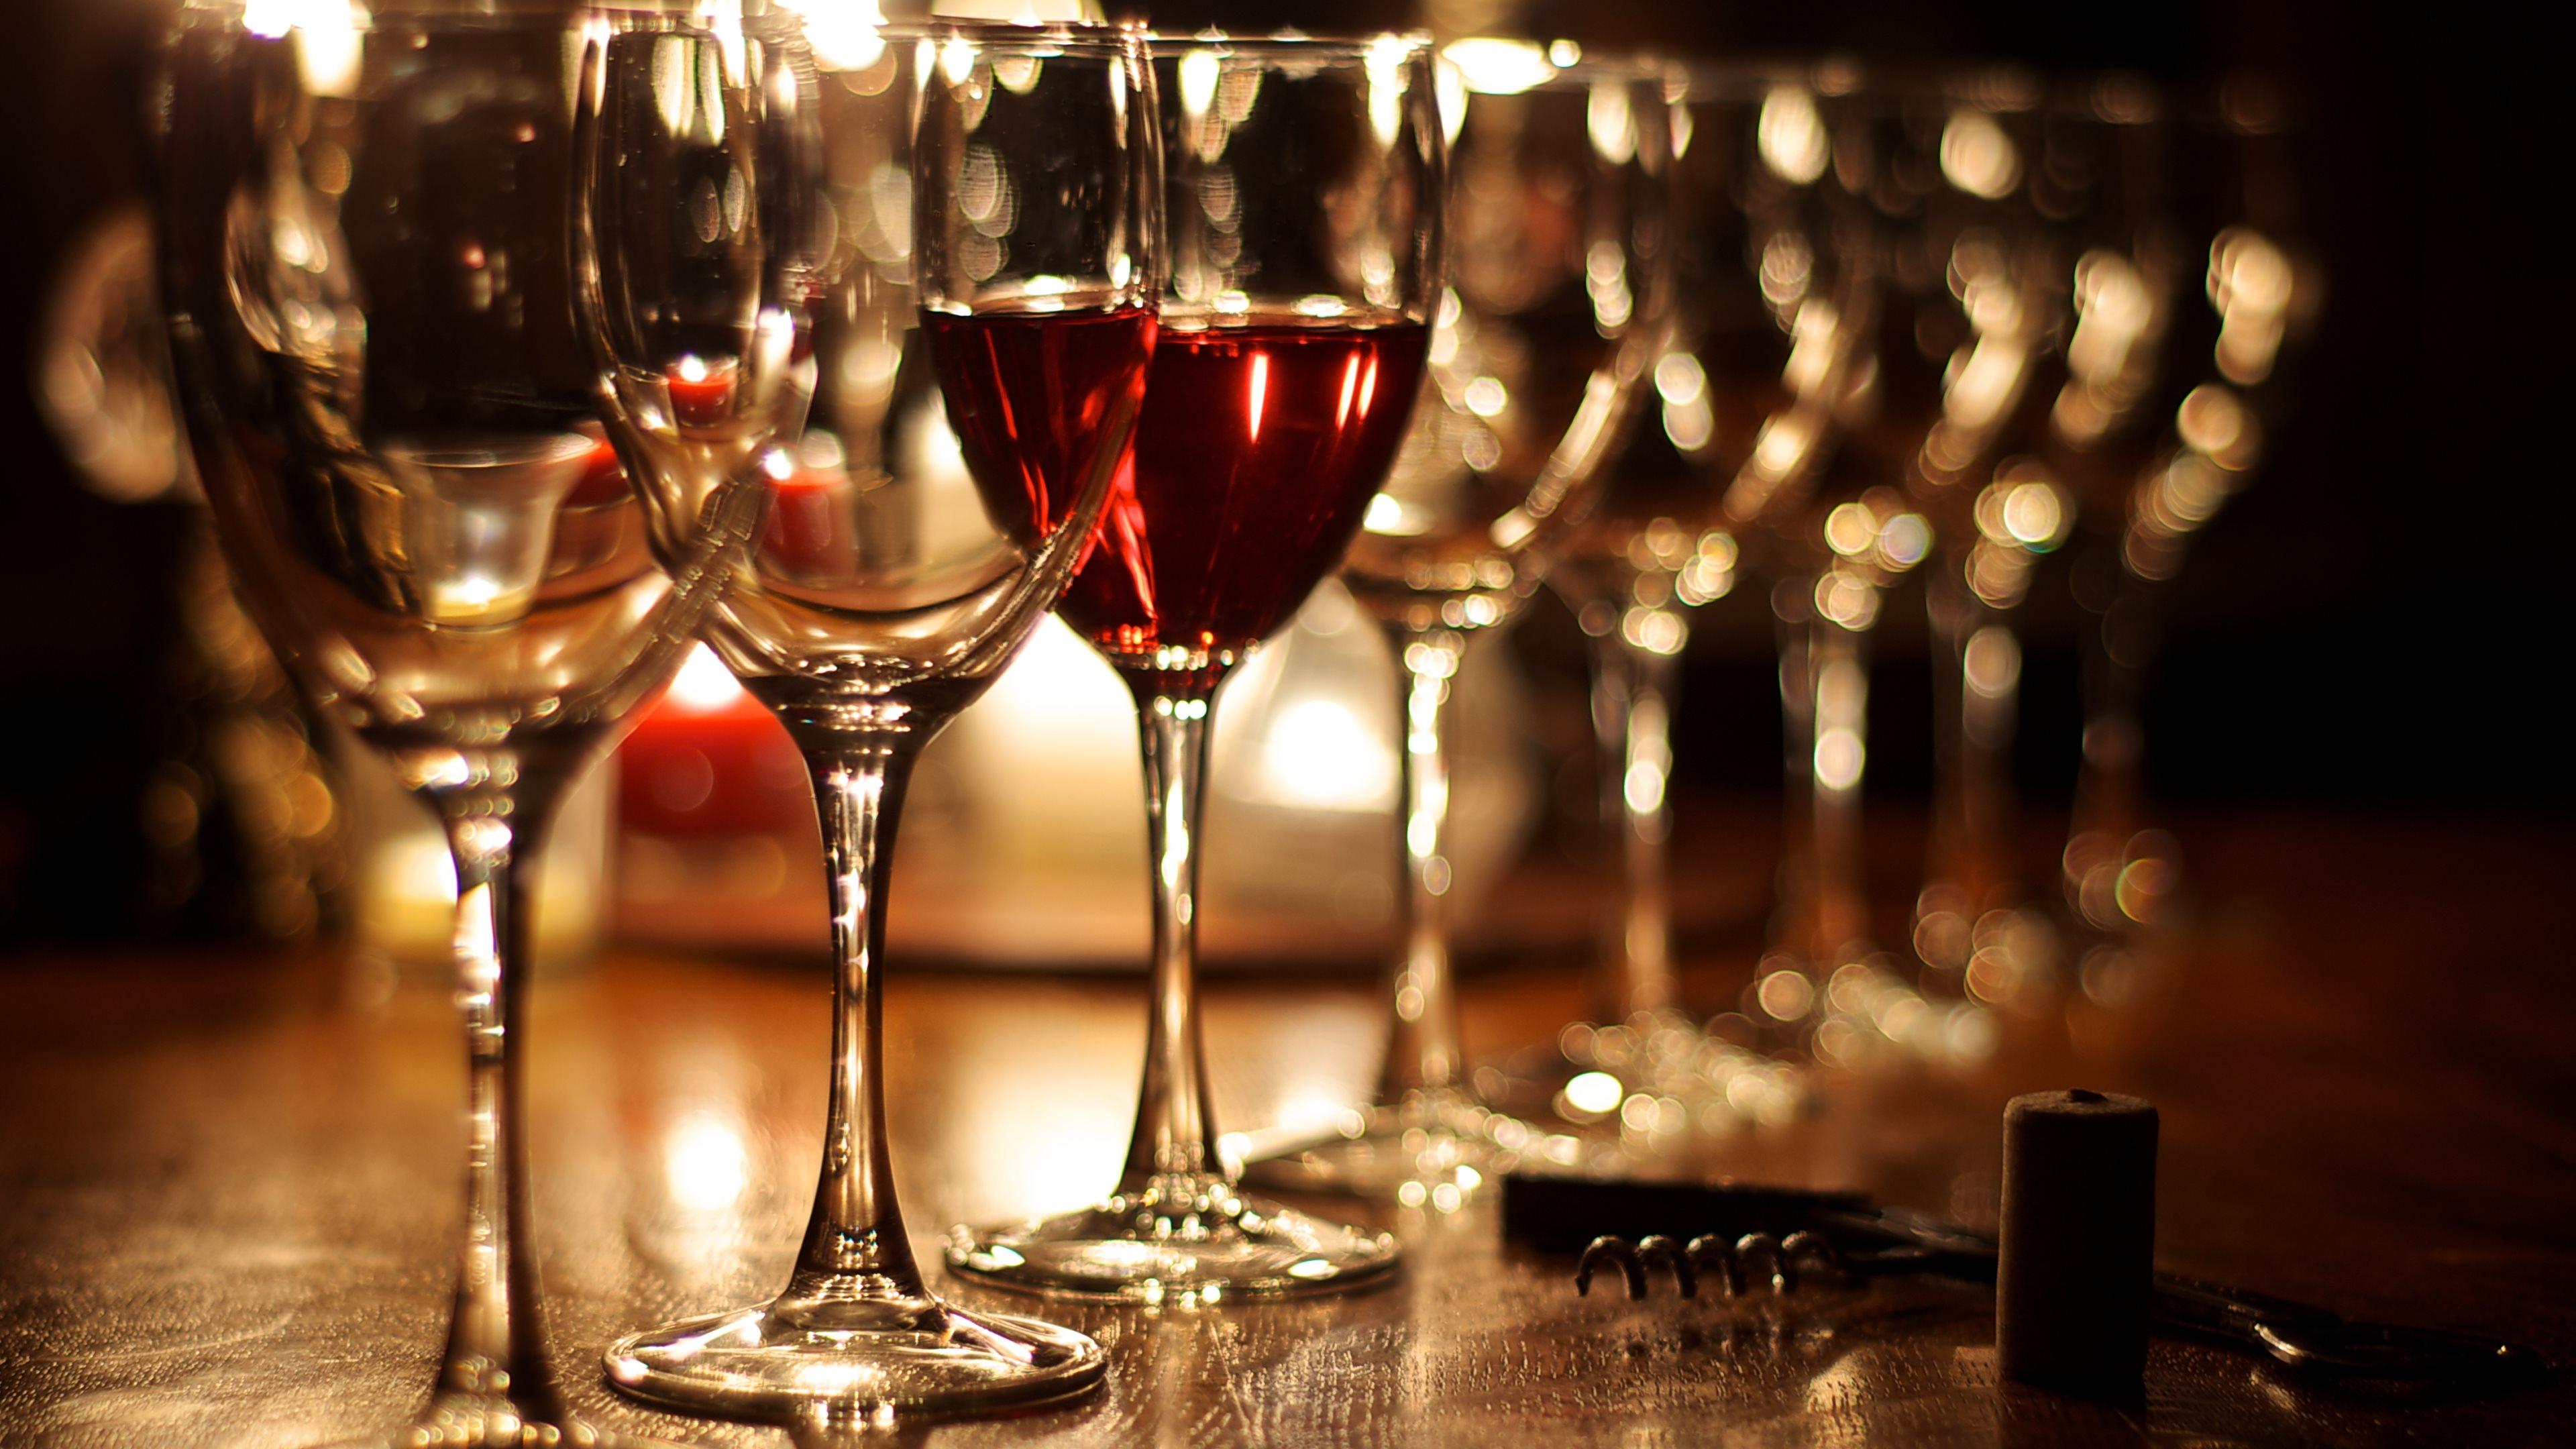 Wine Glass 4k Desktop Wallpaper 530 3840x2160 px PickyWallpaperscom 3840x2160